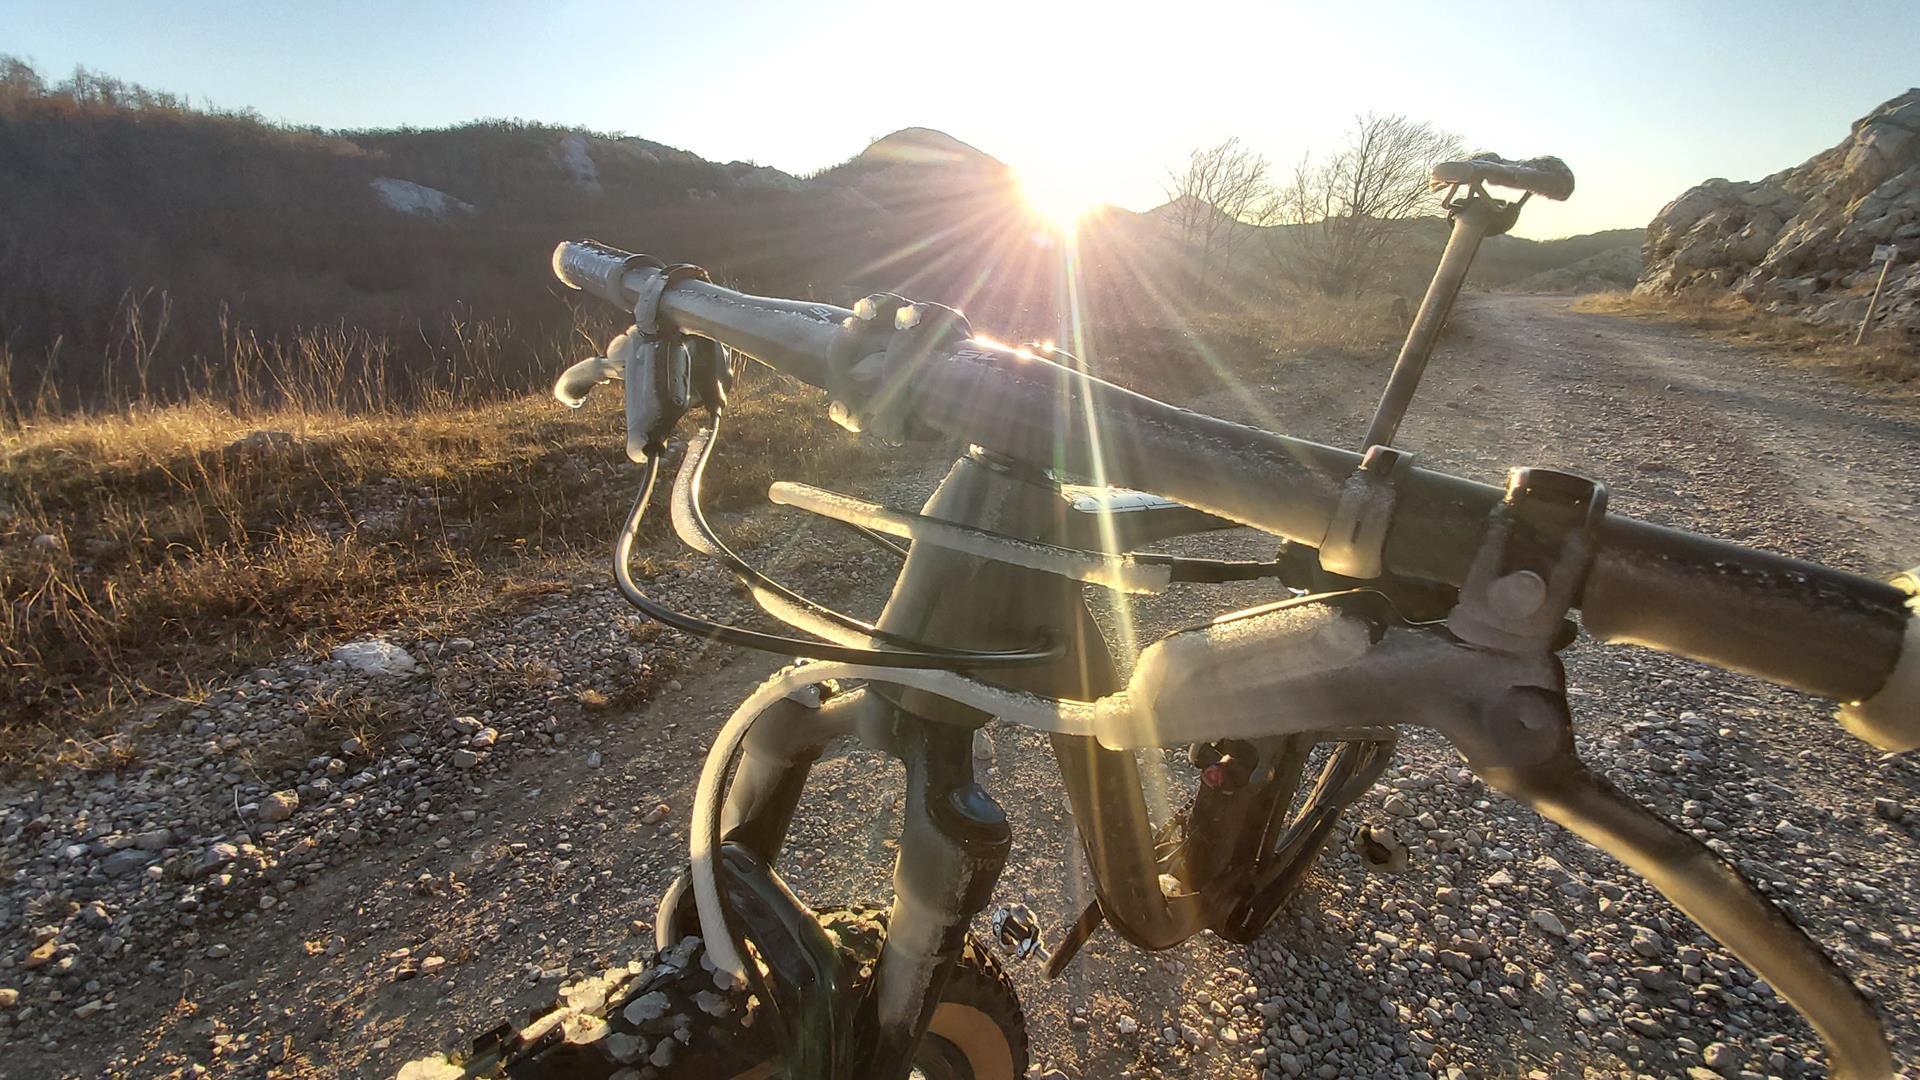 zima_mtb_biciklizam6.jpg (357 KB)